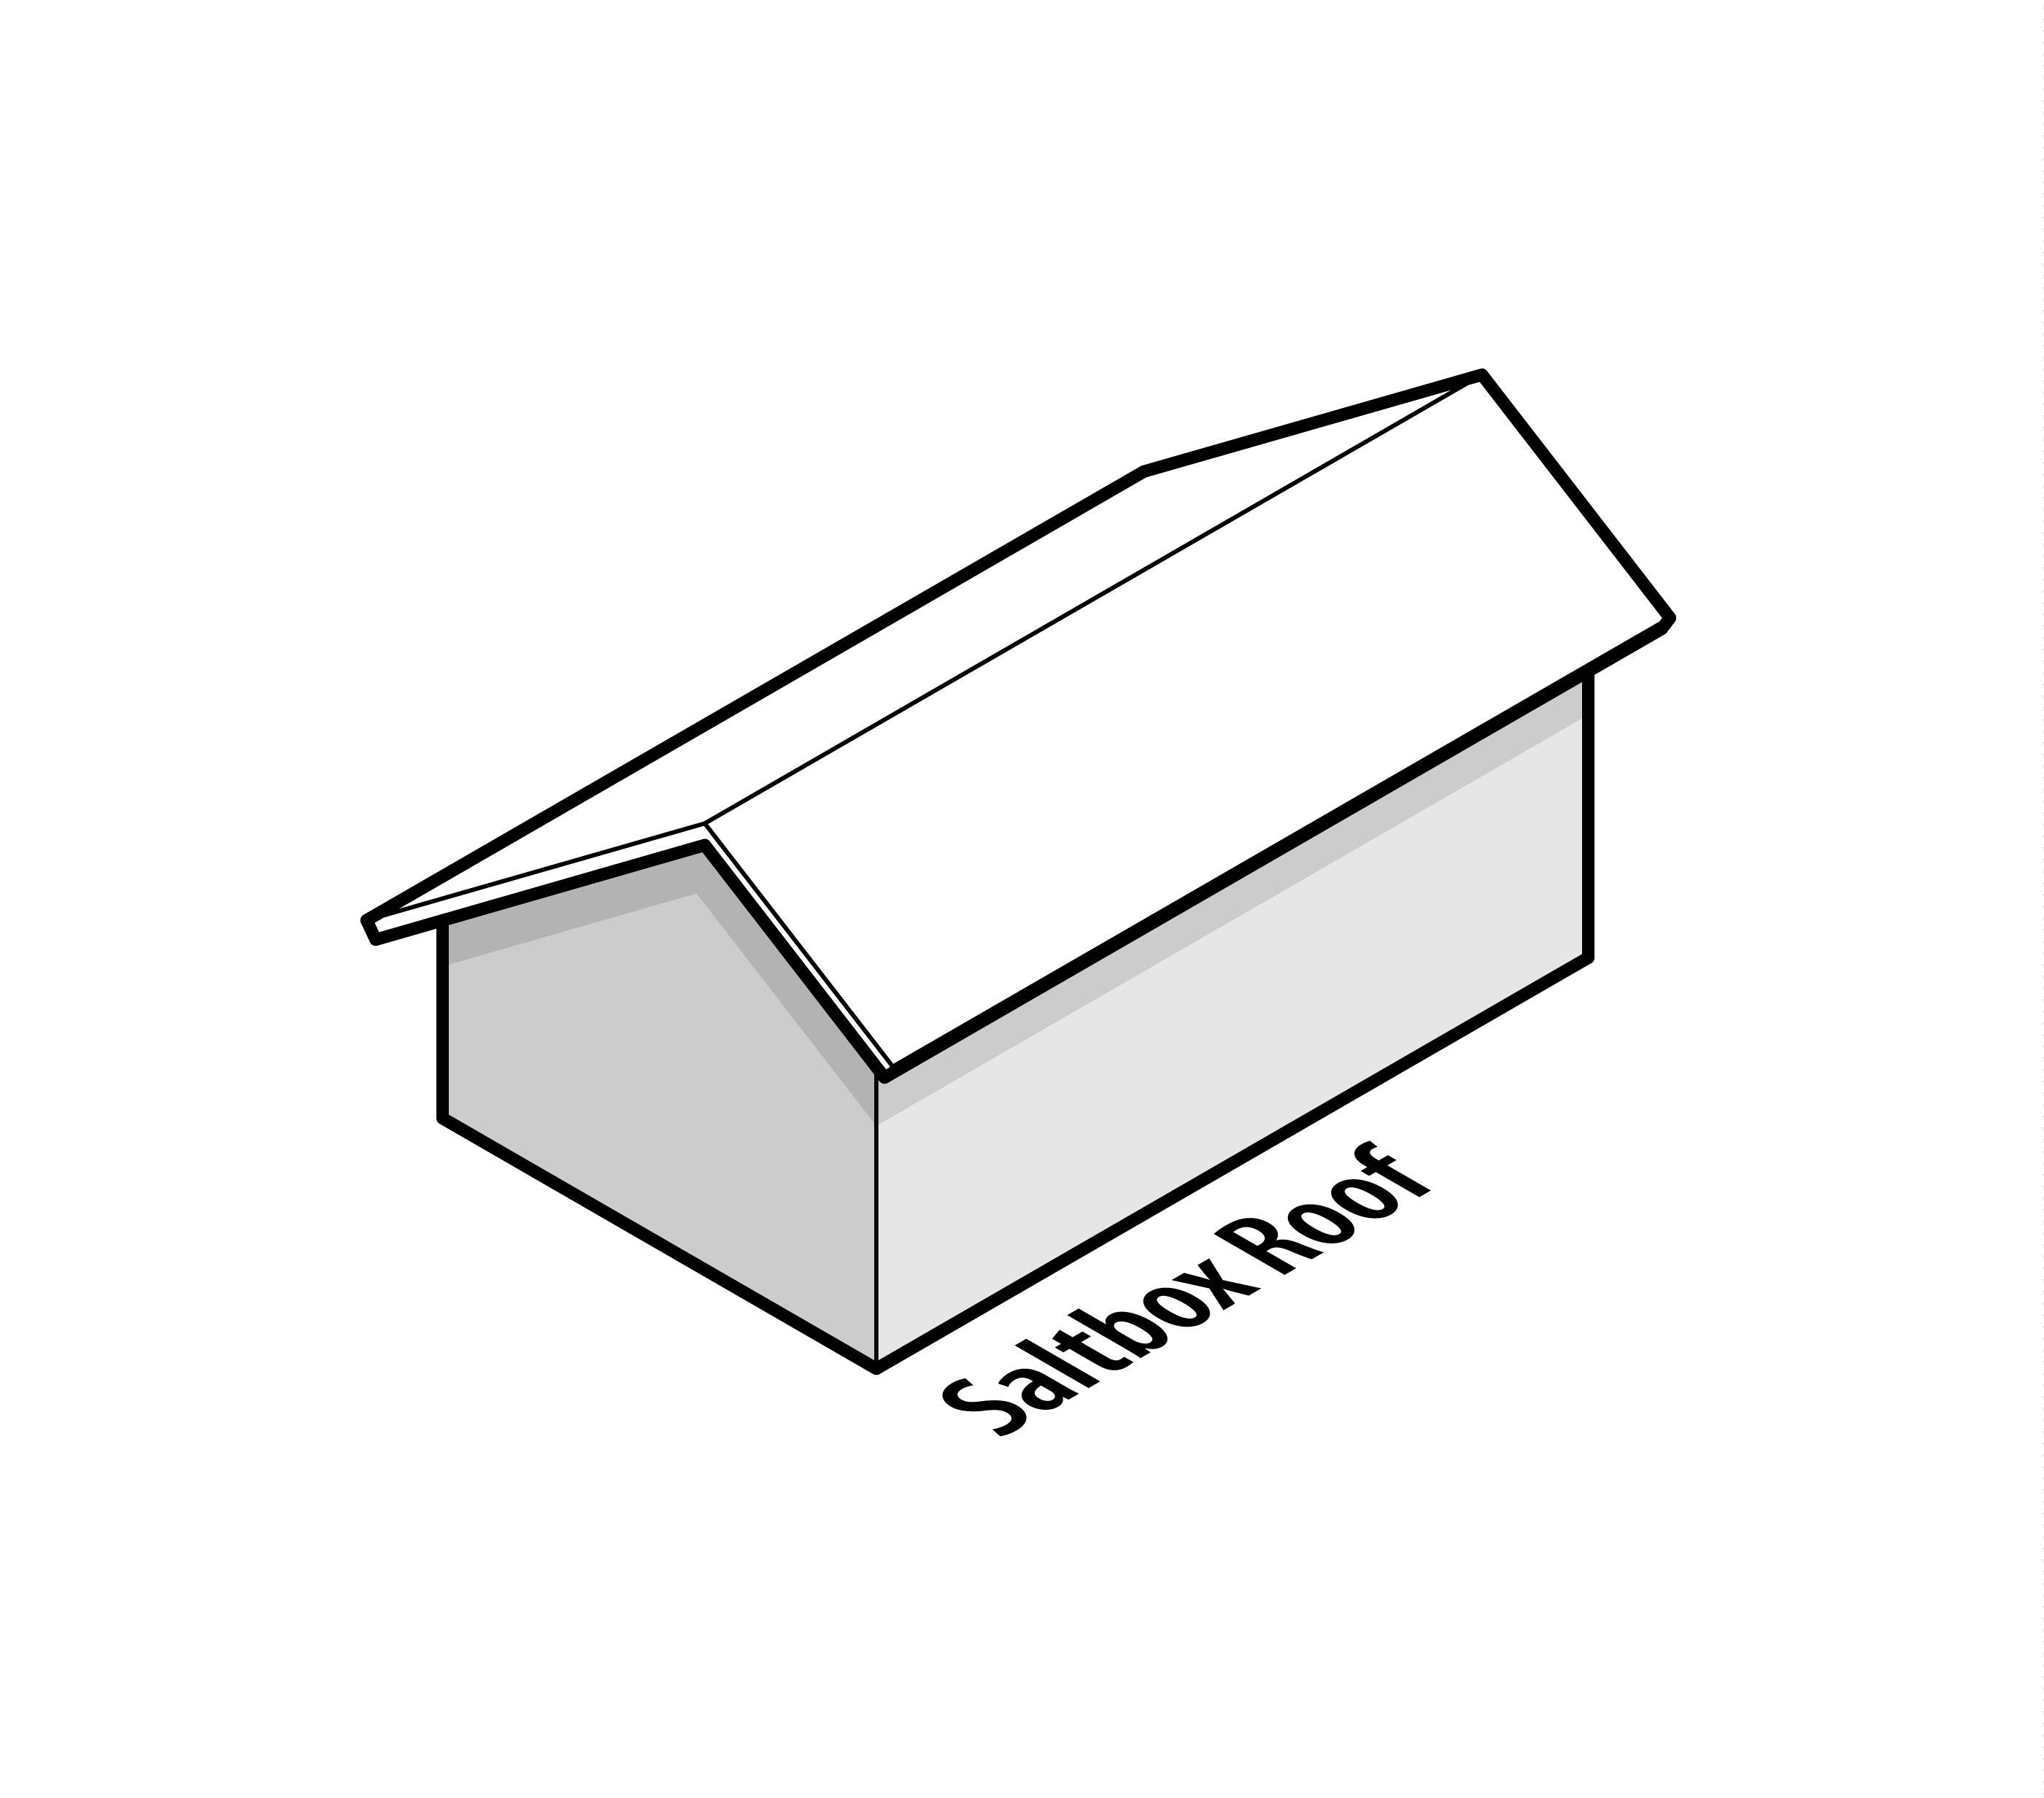 Saltbox Roof Design